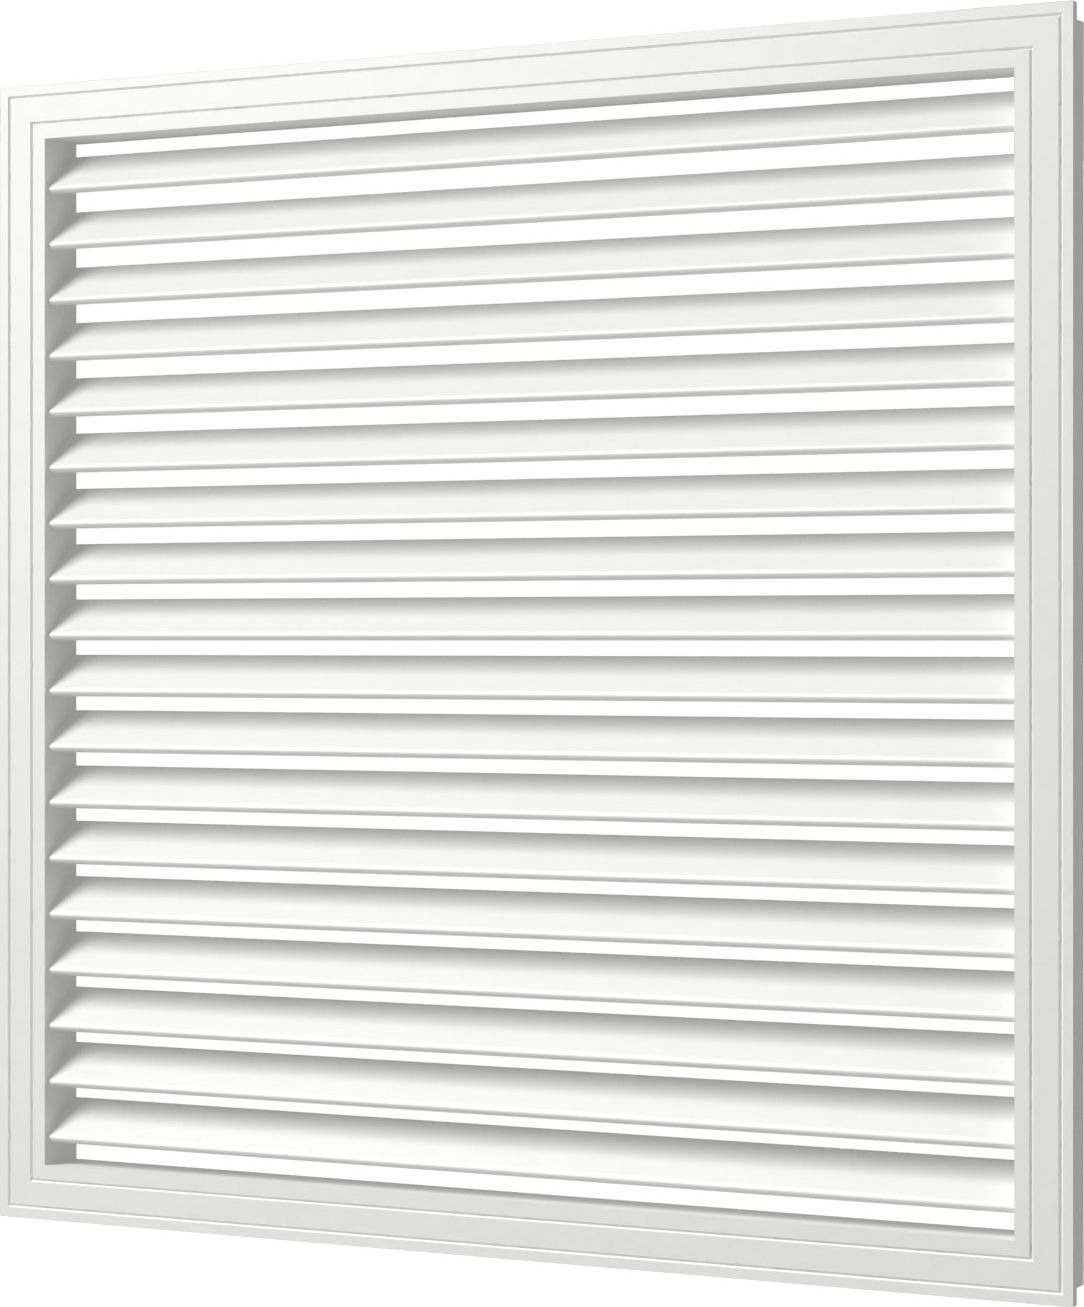 цена Вентиляционная решетка ERA, П6060Р, белый онлайн в 2017 году